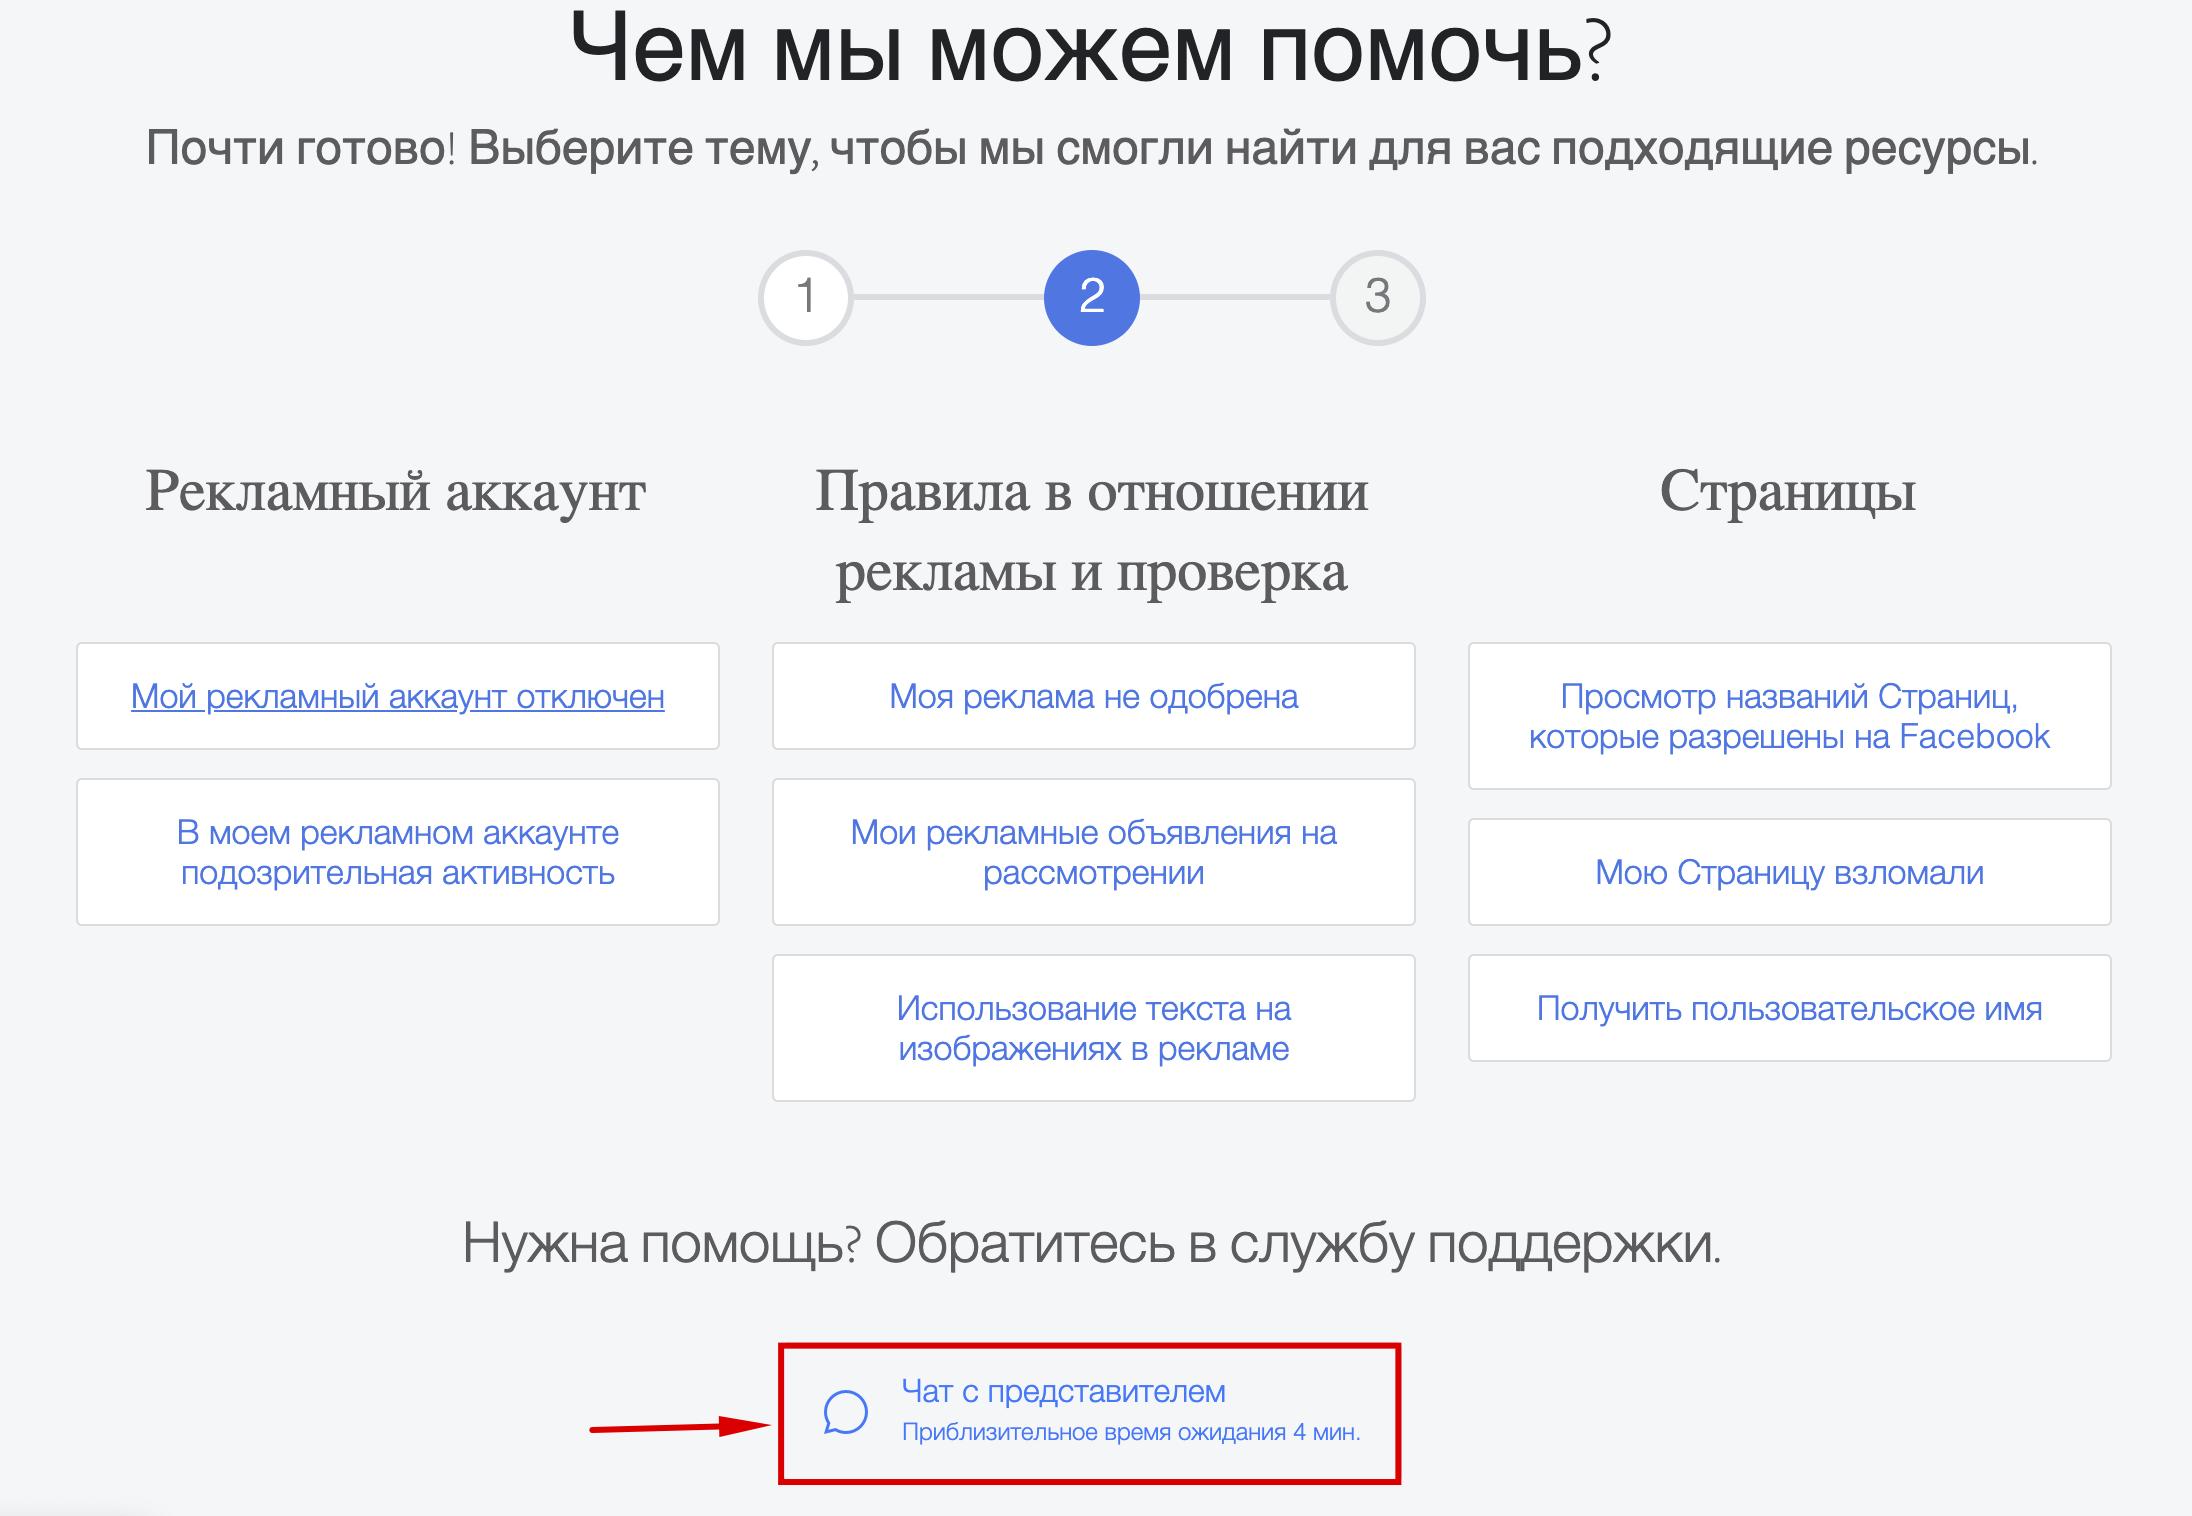 kak-razblokirovat-menedzher-reklamy-Facebook-3.png